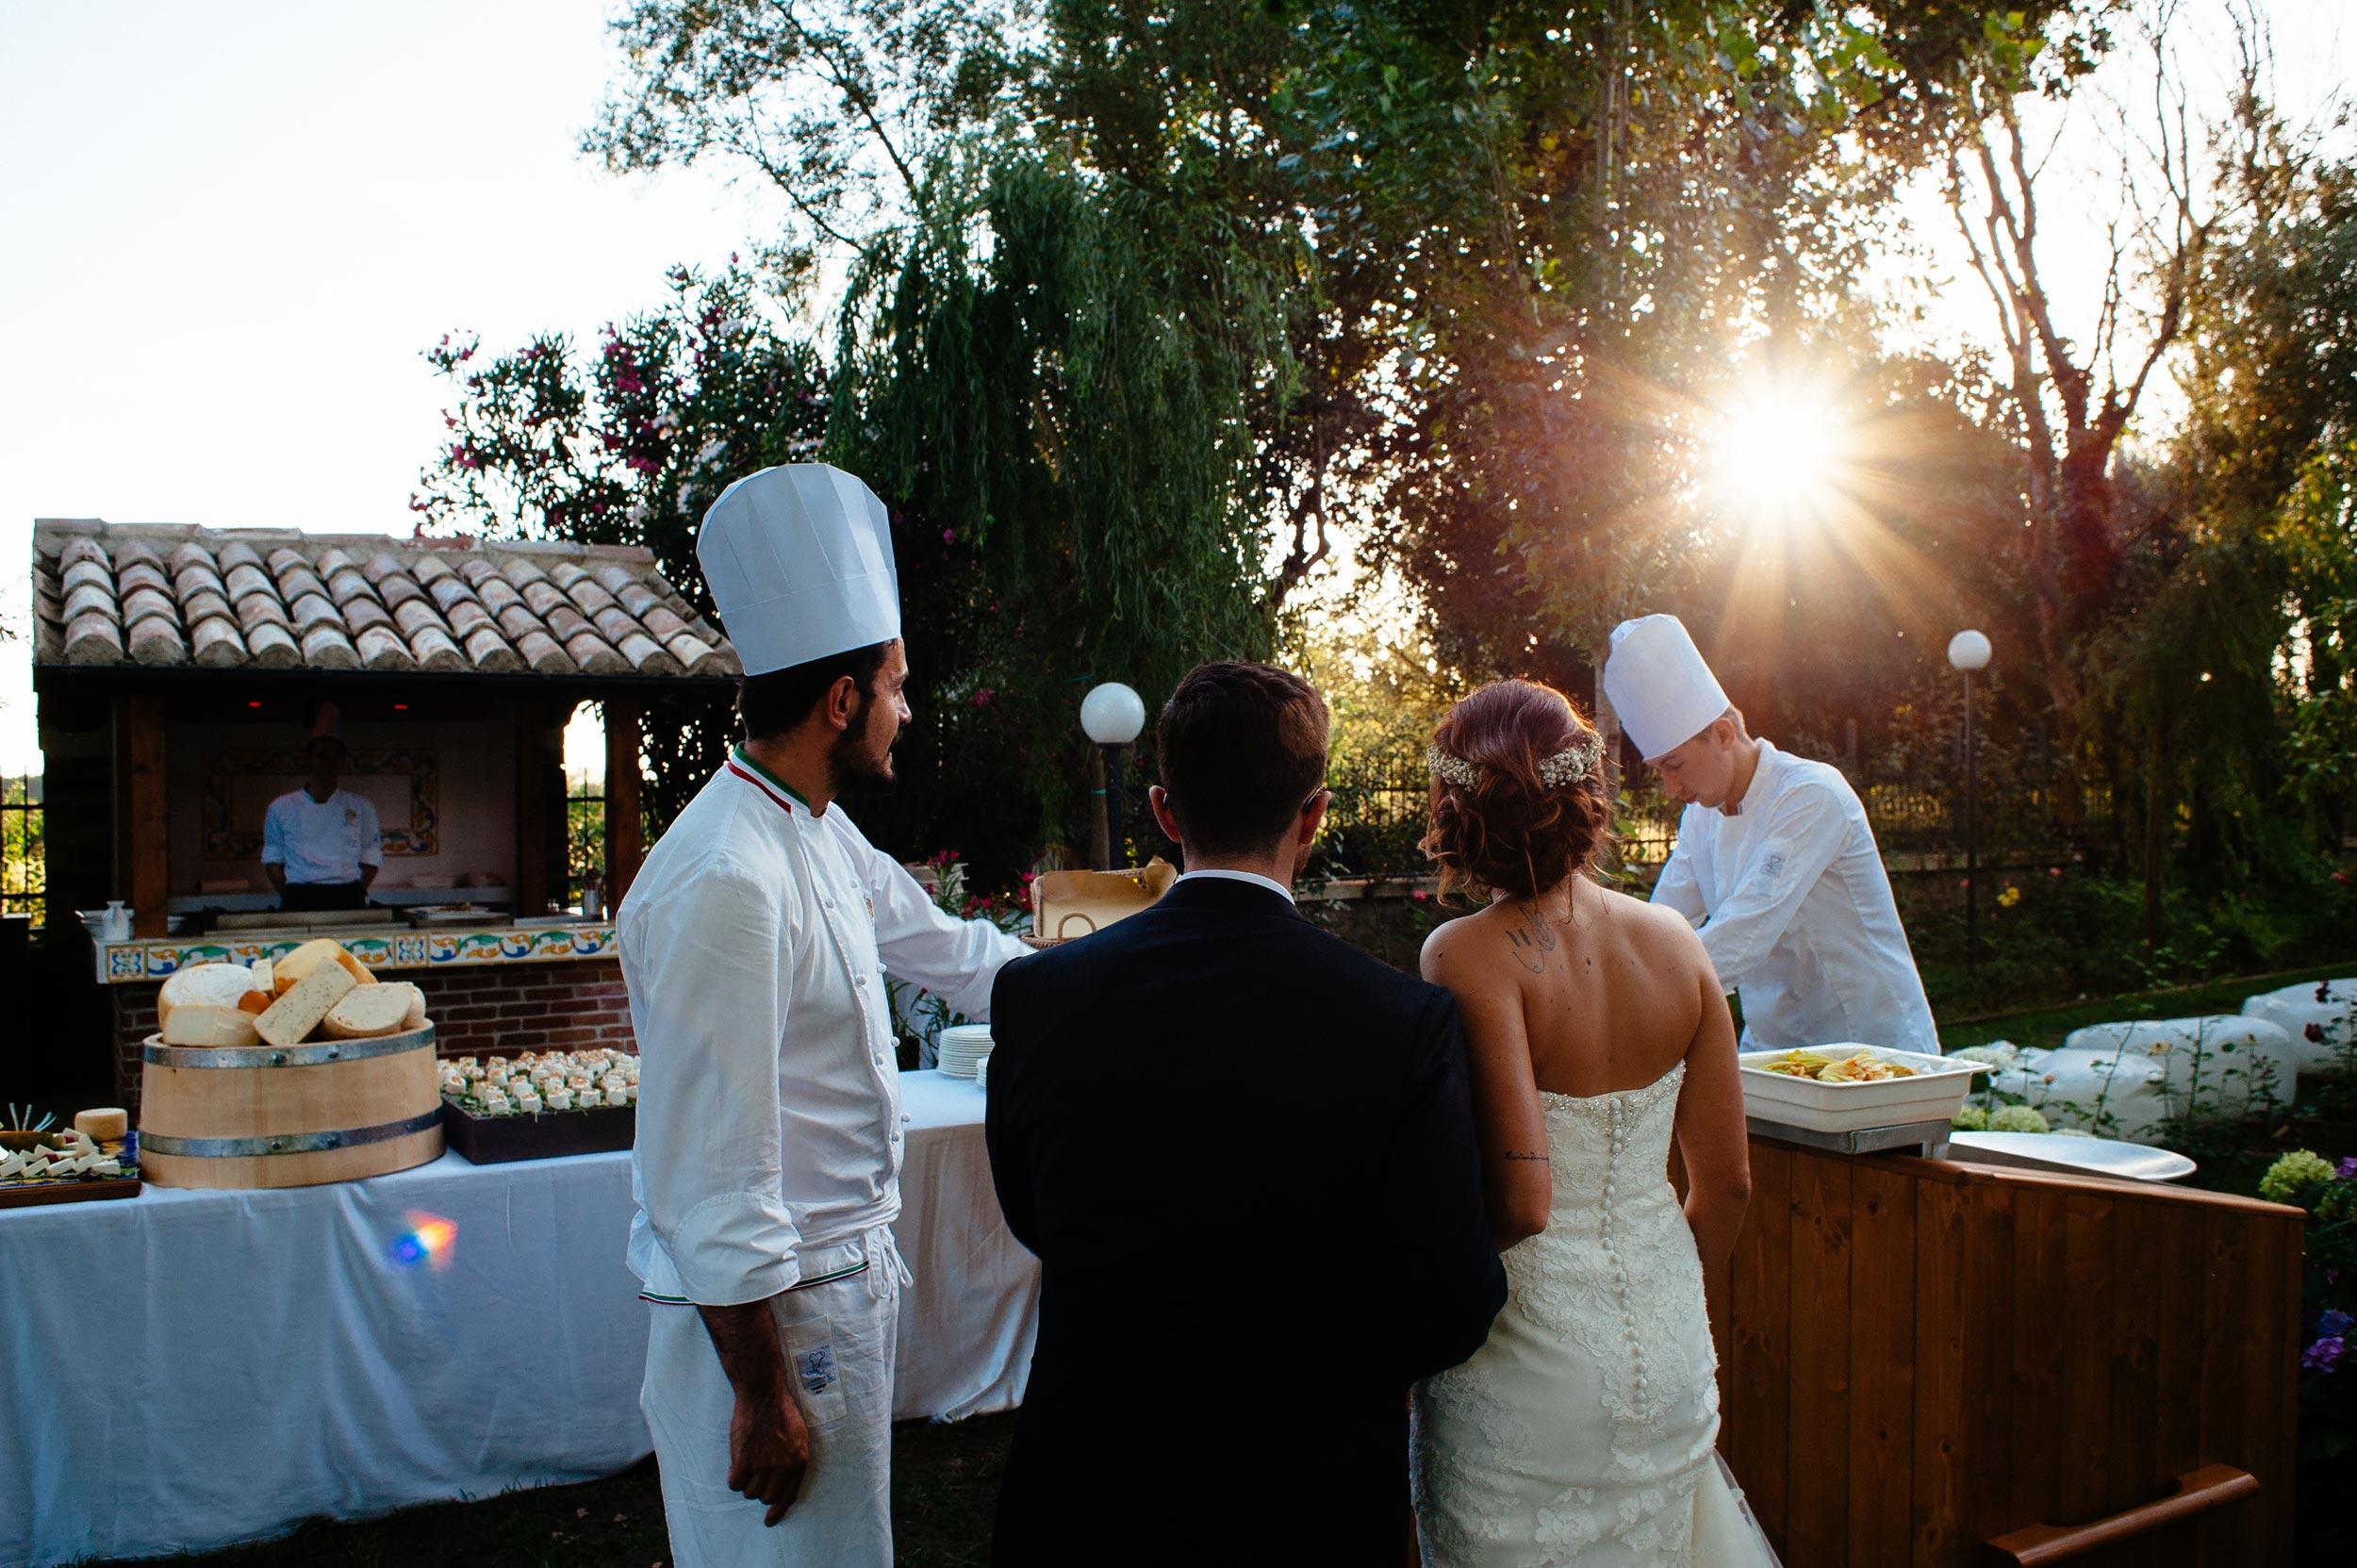 2016-Claudio-Teresa-Naples-Wedding-Photographer-Italy-Alessandro-Avenali-77.jpg